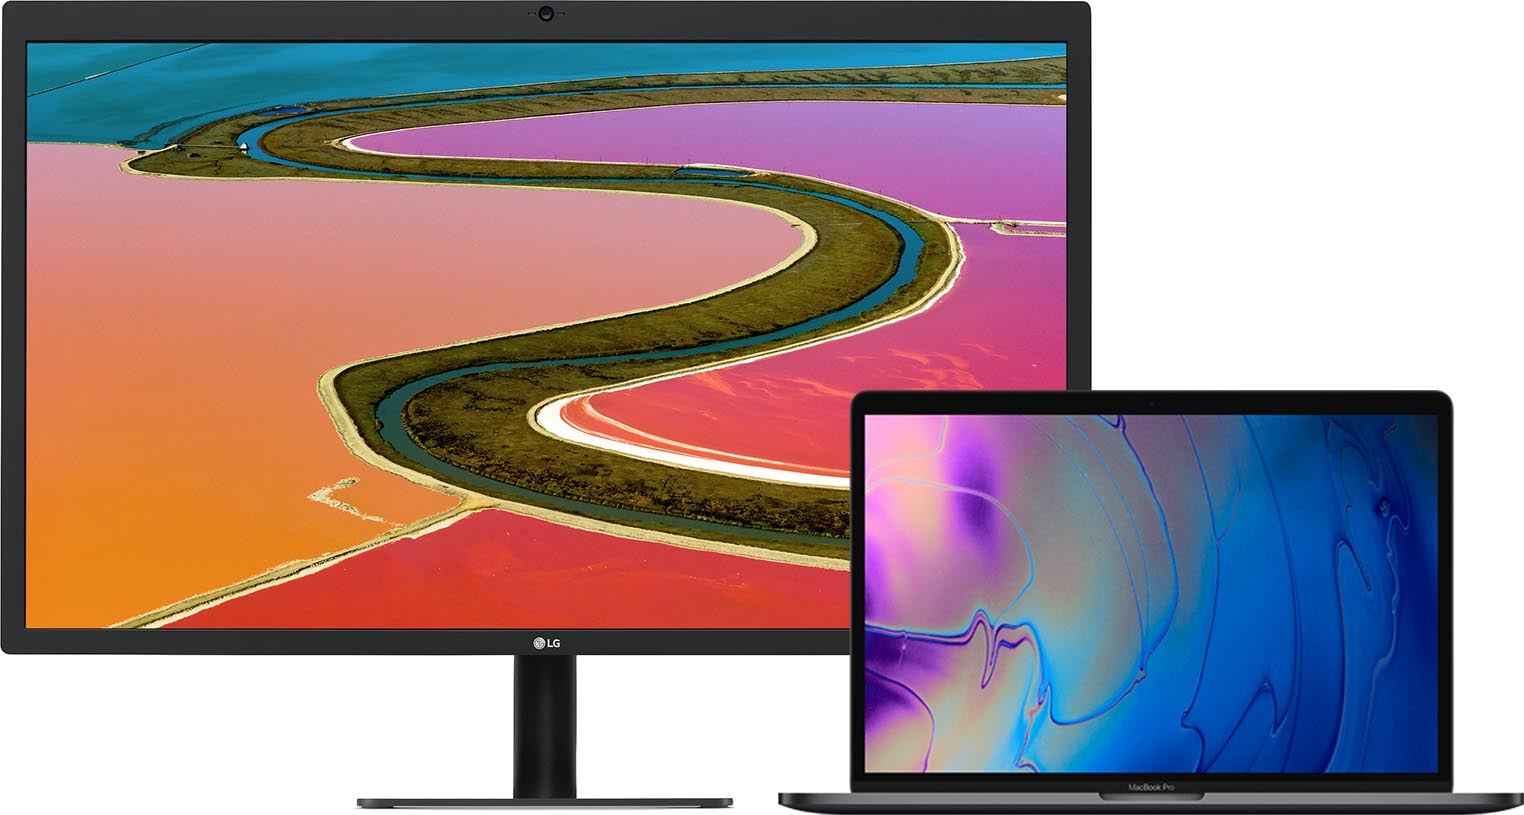 MacBook Pro 2018 UltraFine Display